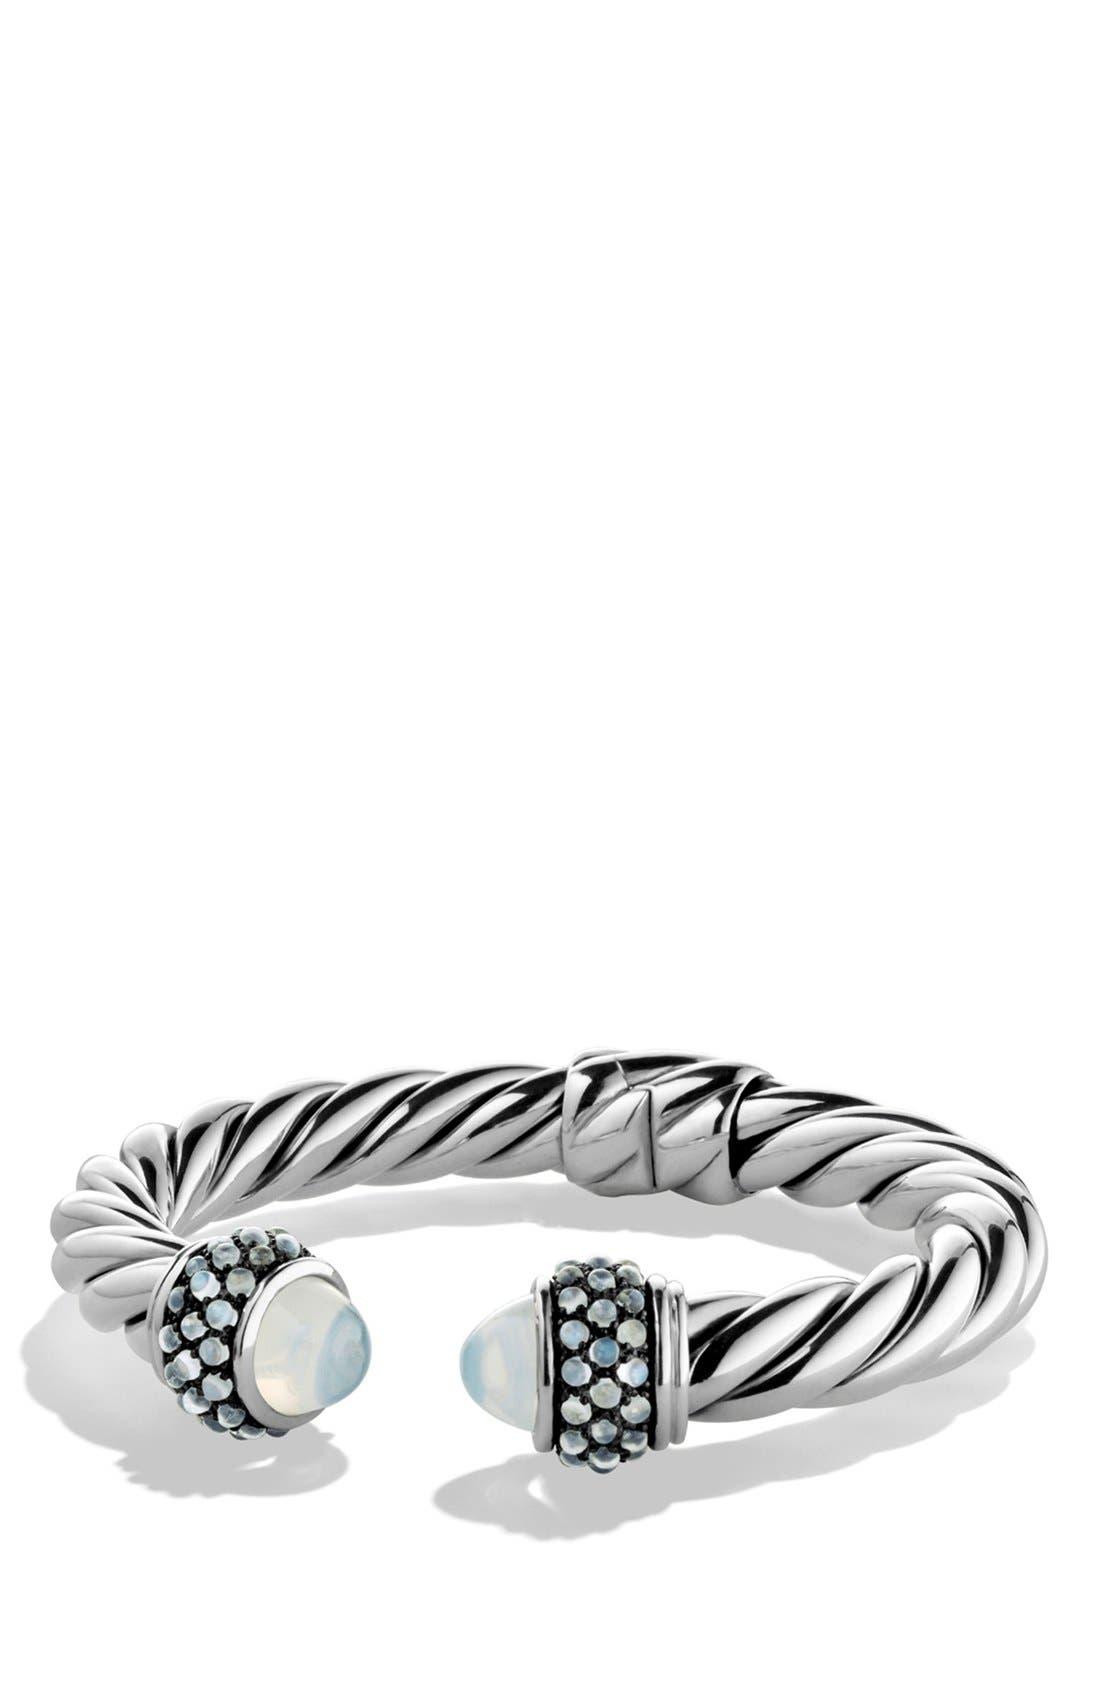 Bracelet with Semiprecious Stones, 10mm,                         Main,                         color, MOON/ MILKY QUARTZ